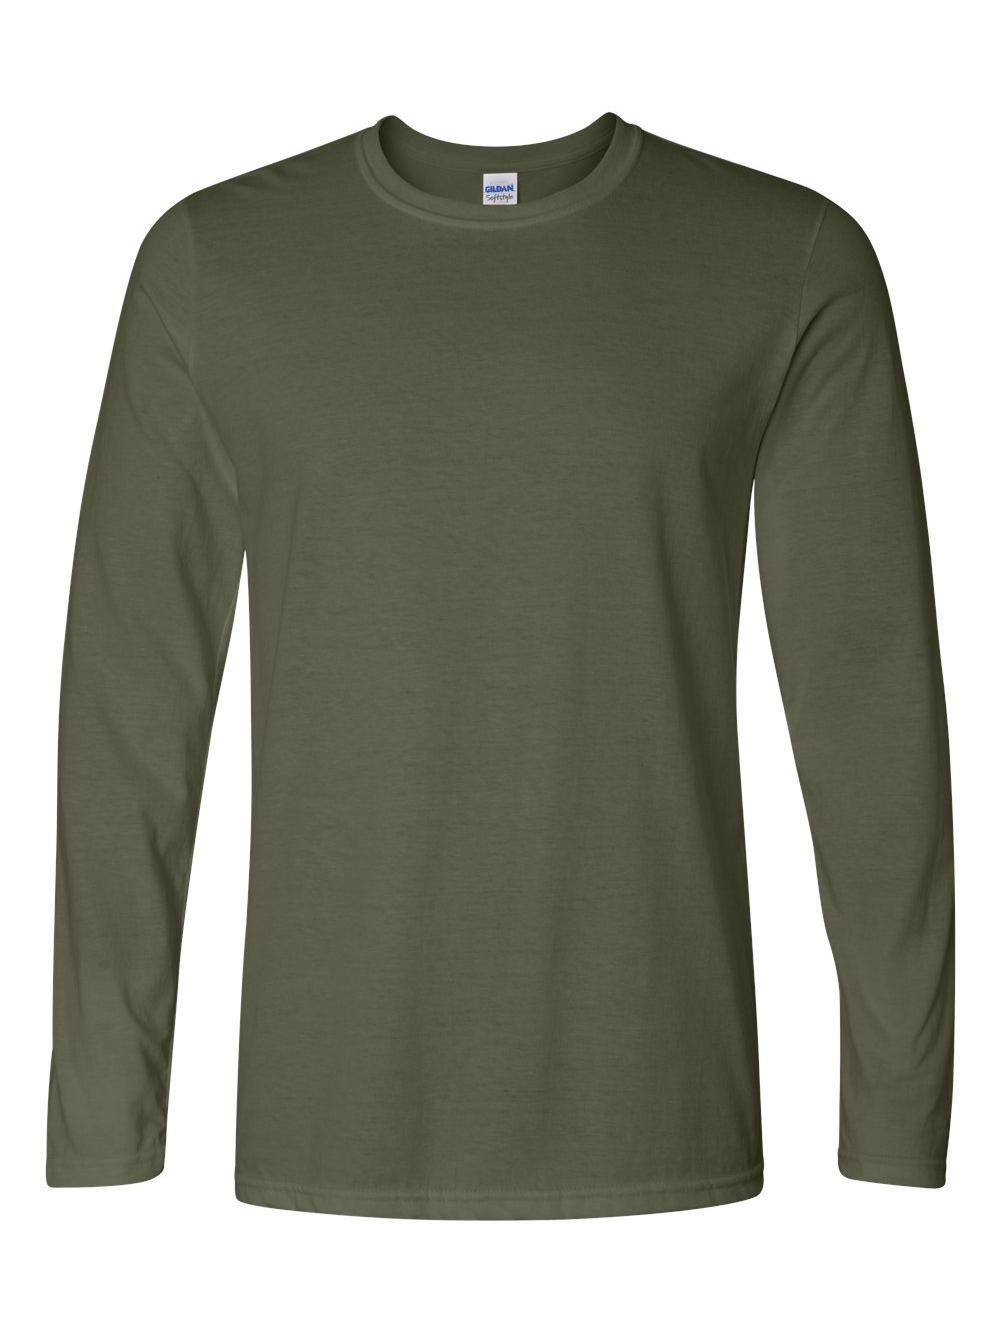 Gildan-Softstyle-Long-Sleeve-T-Shirt-64400 thumbnail 12